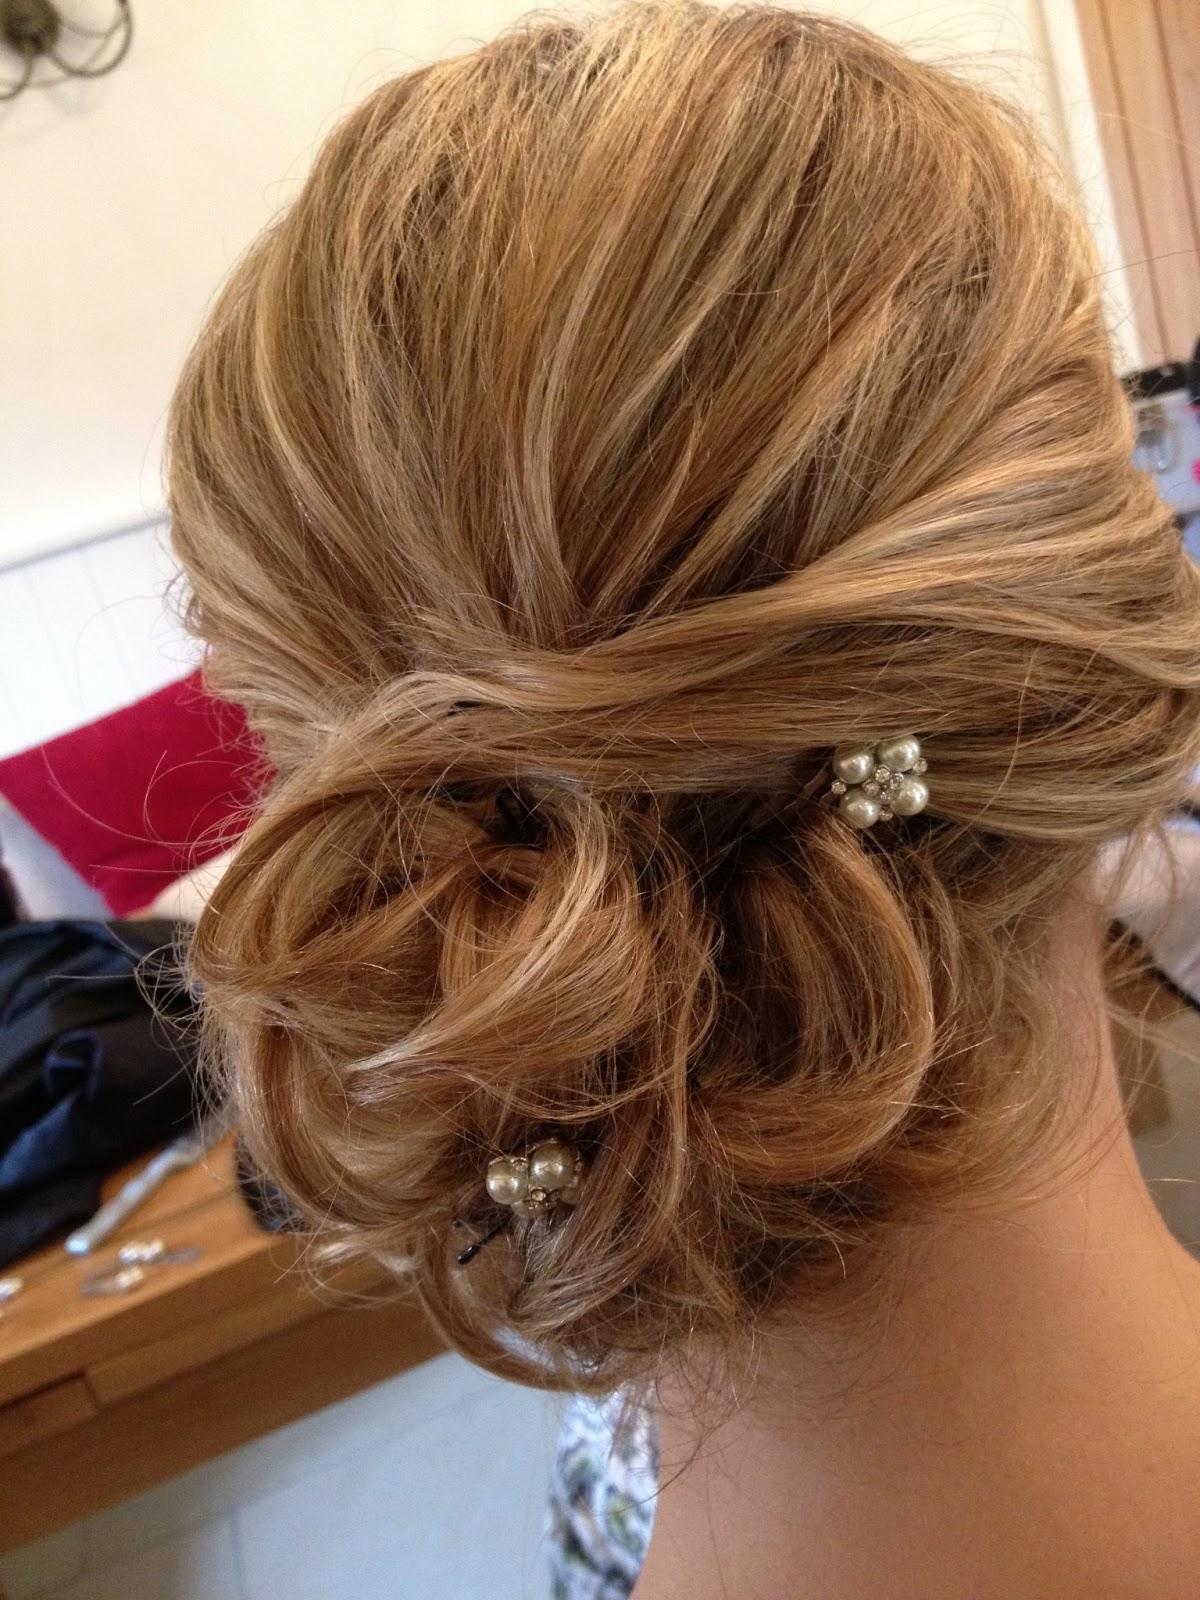 Fordham Hair Design ... Wedding Bridal Hair Specialist ...